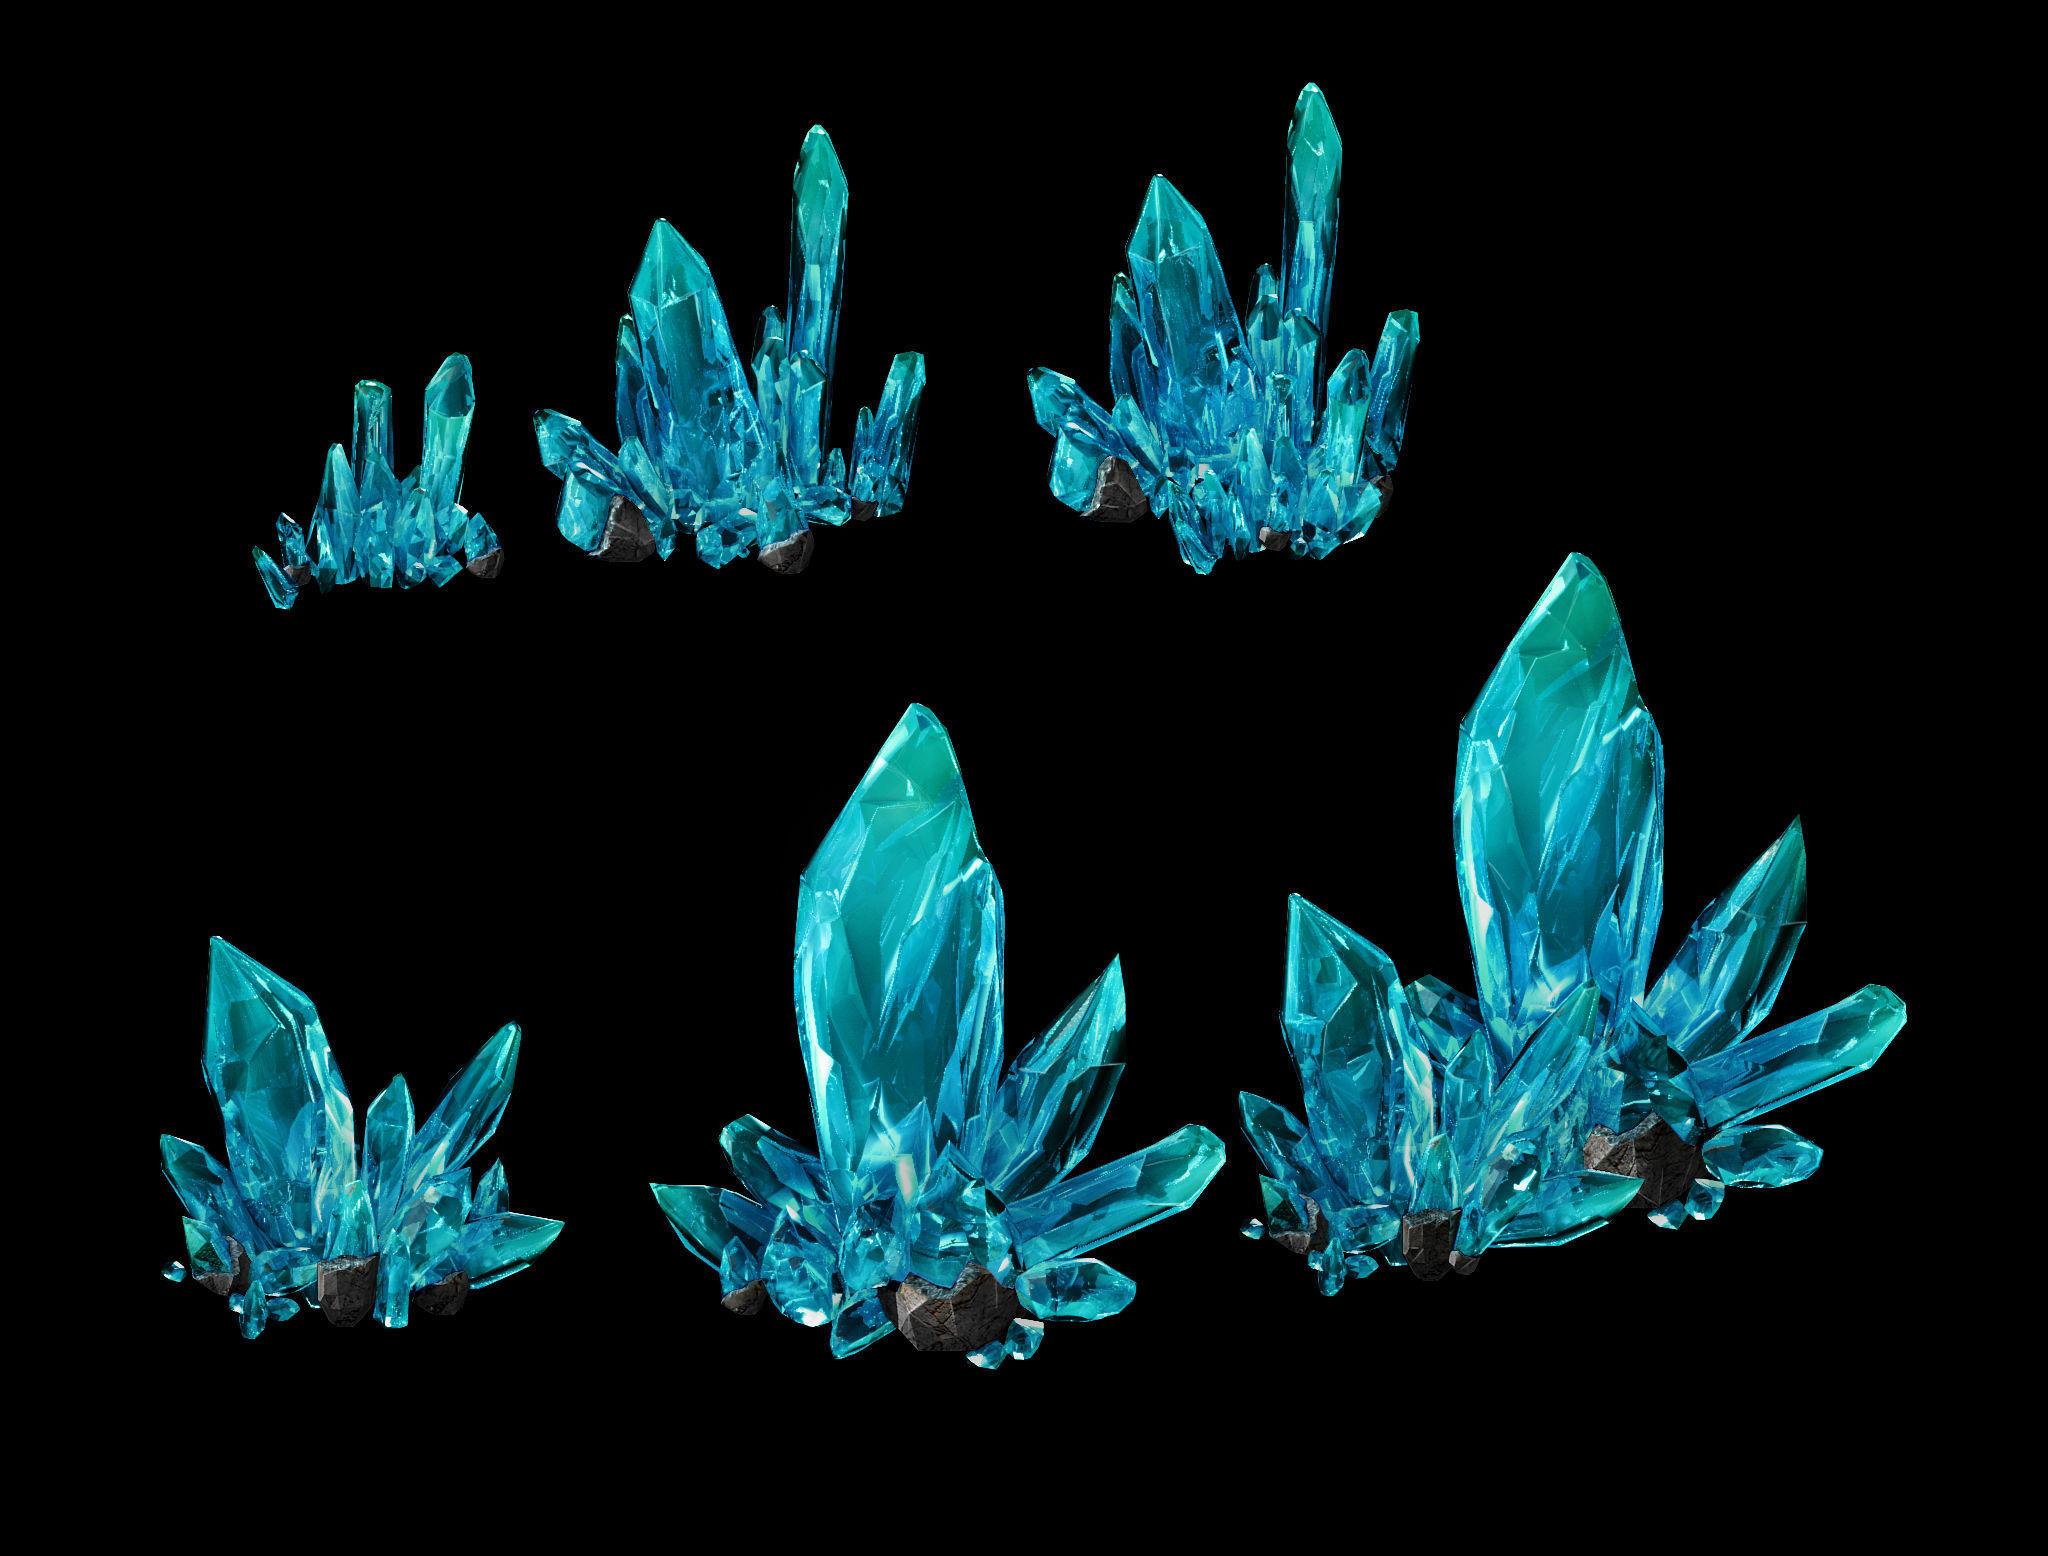 Heterogeneous crystal combination 01